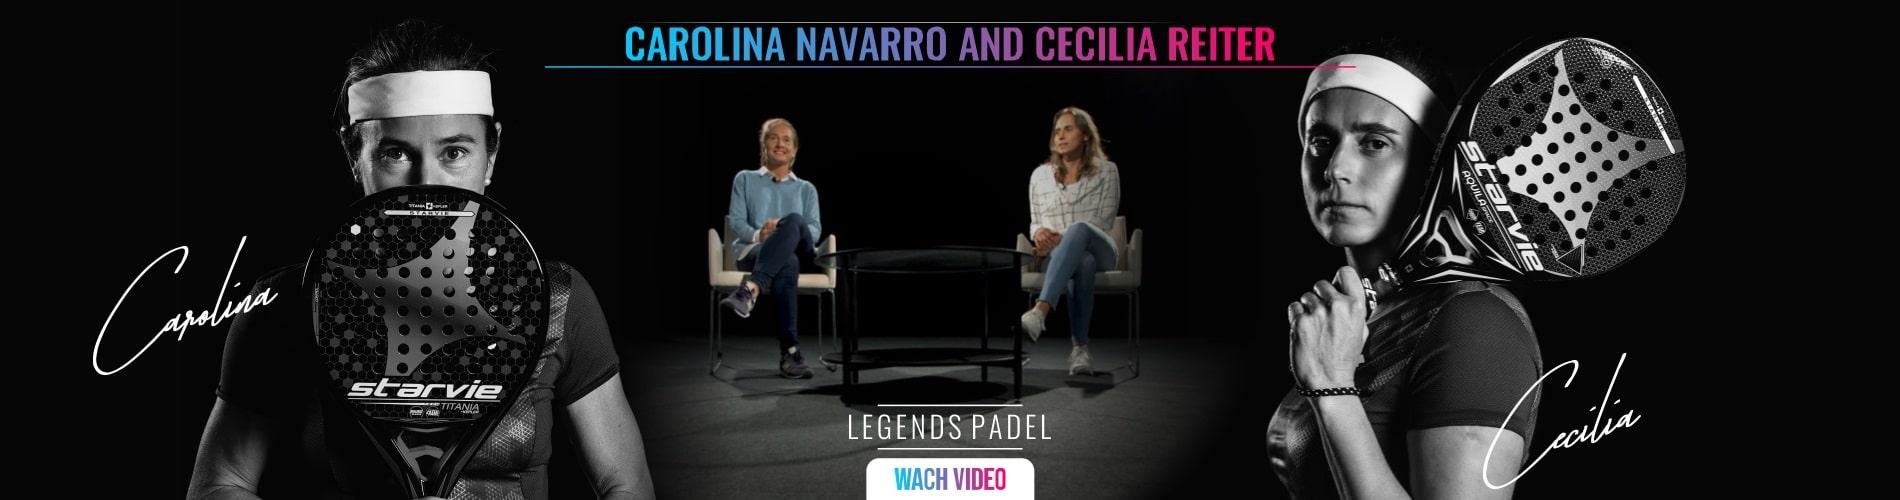 Documentary Carolina Navarro and Cecilia Reiter. Leyendas del padel